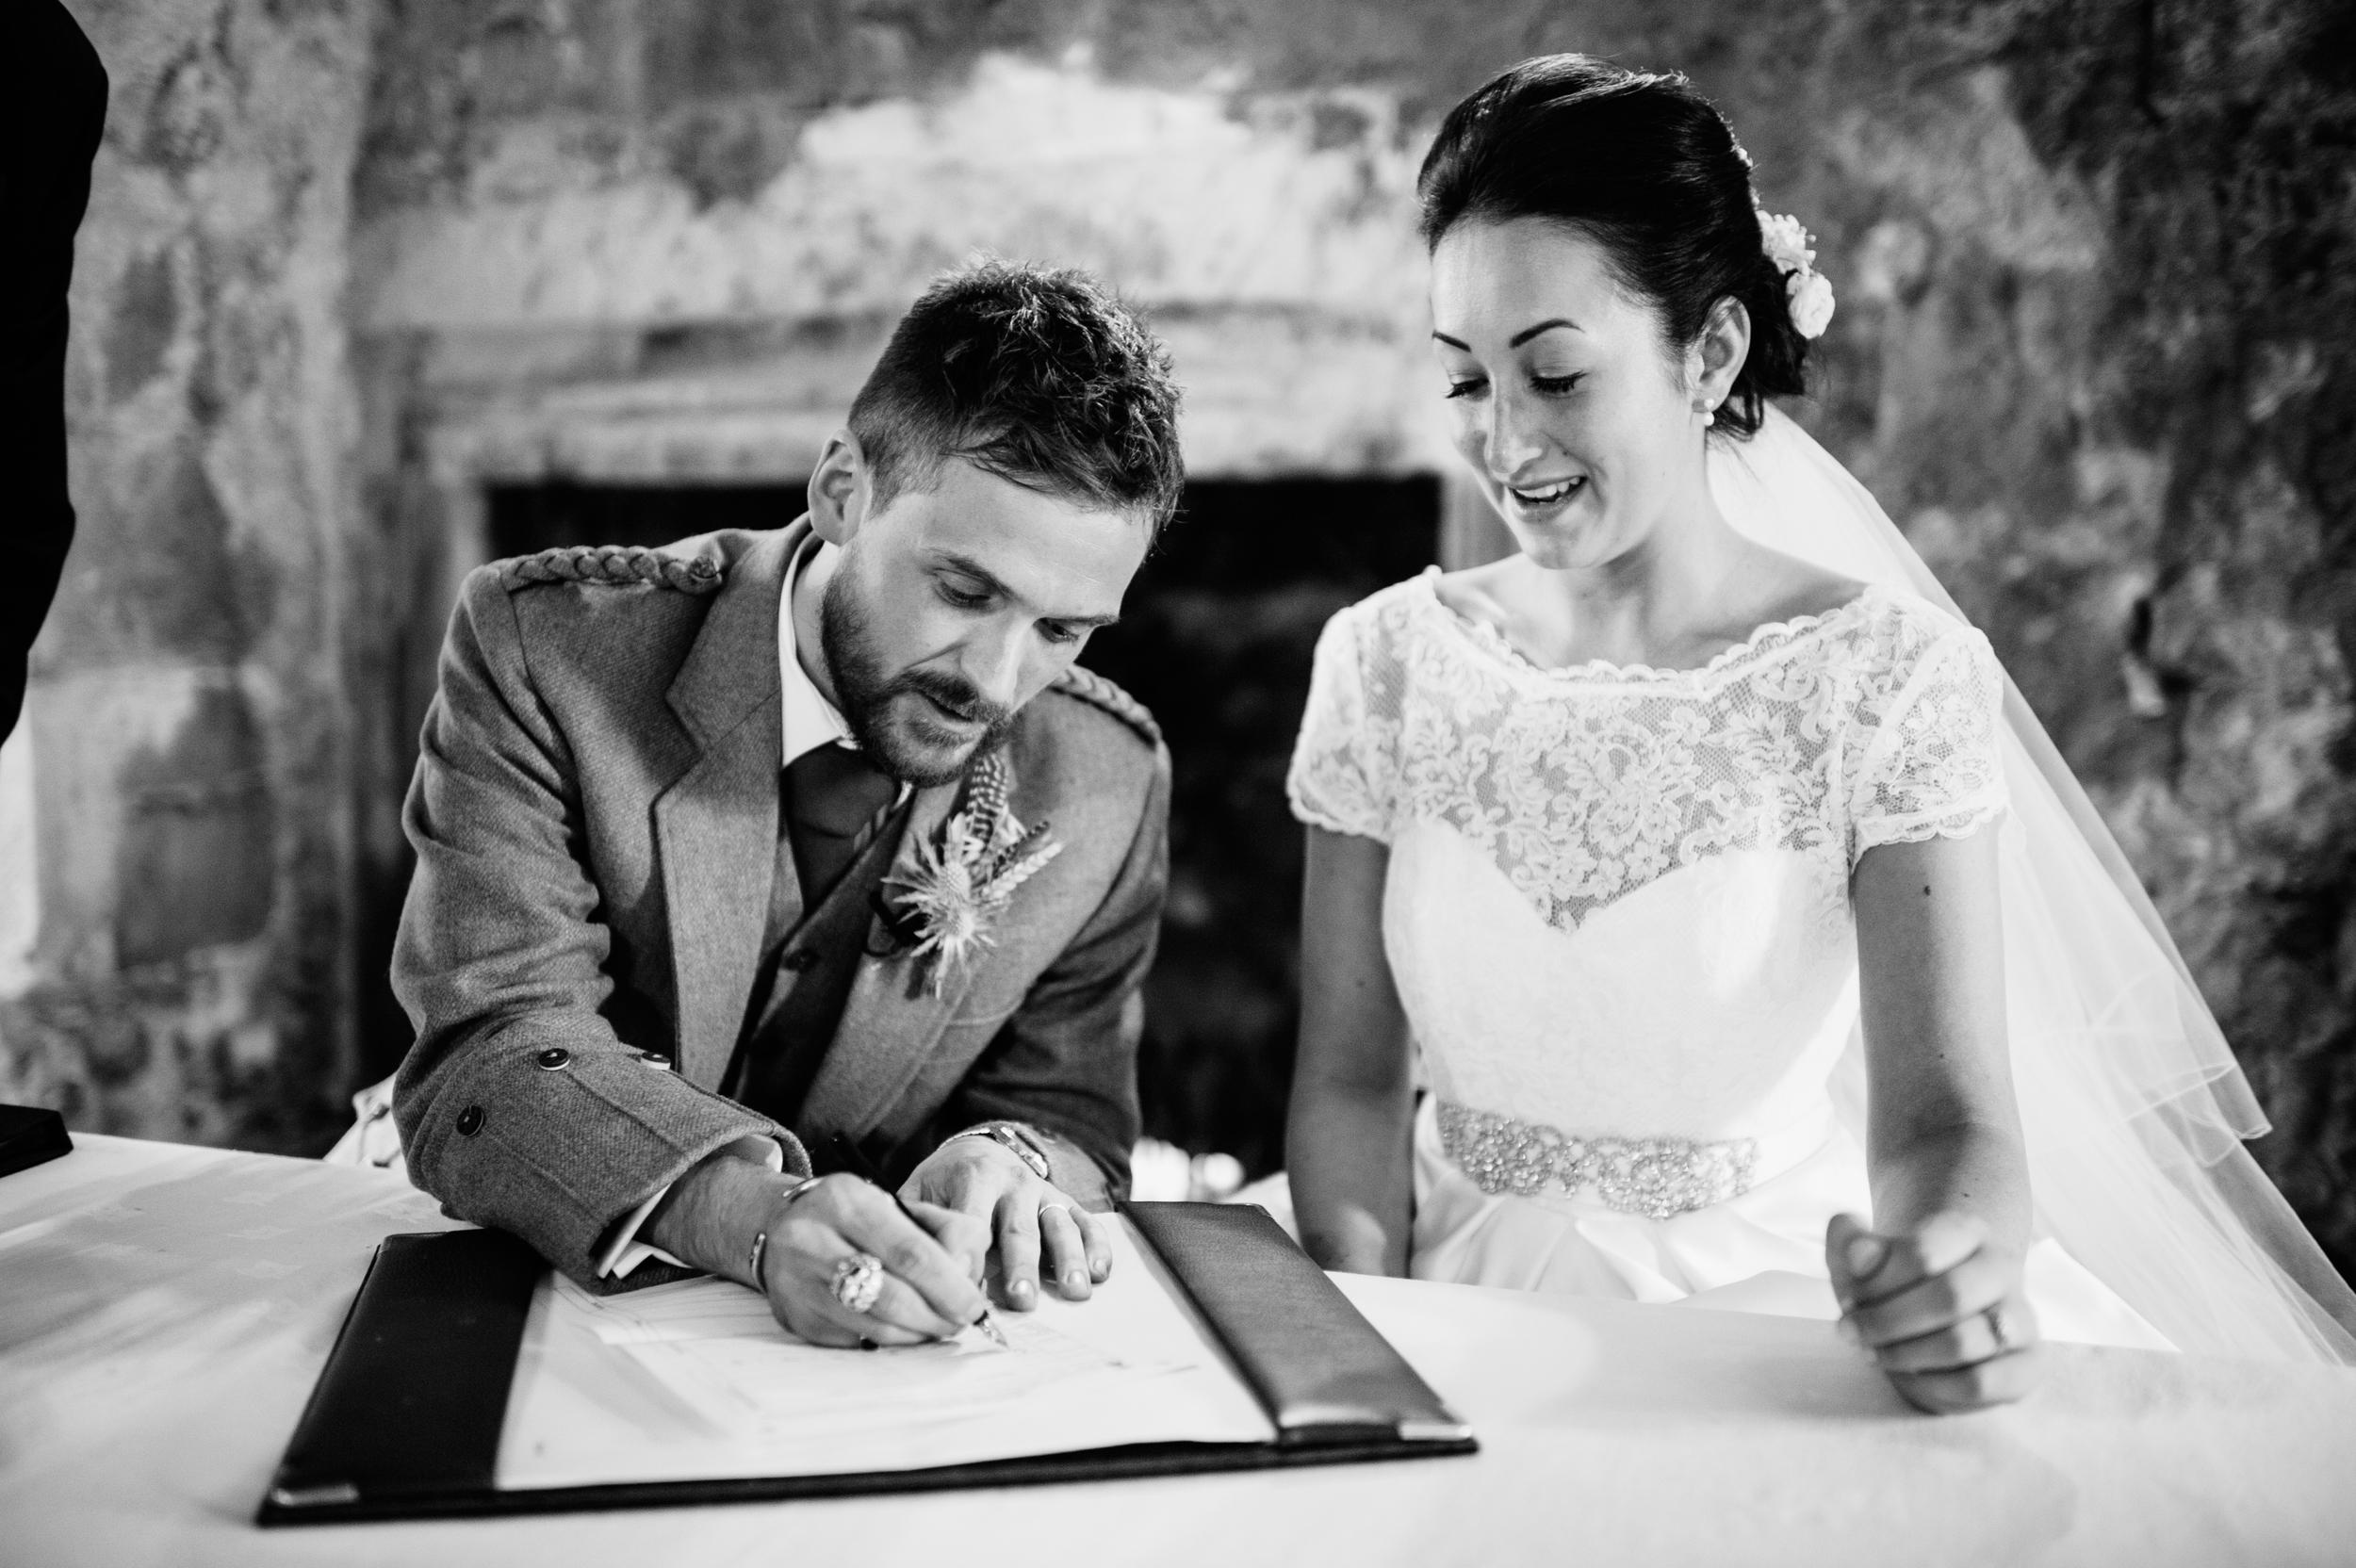 0108-lisa-devine-alternative-creative-wedding-photography-glasgow-edinburgh.JPG